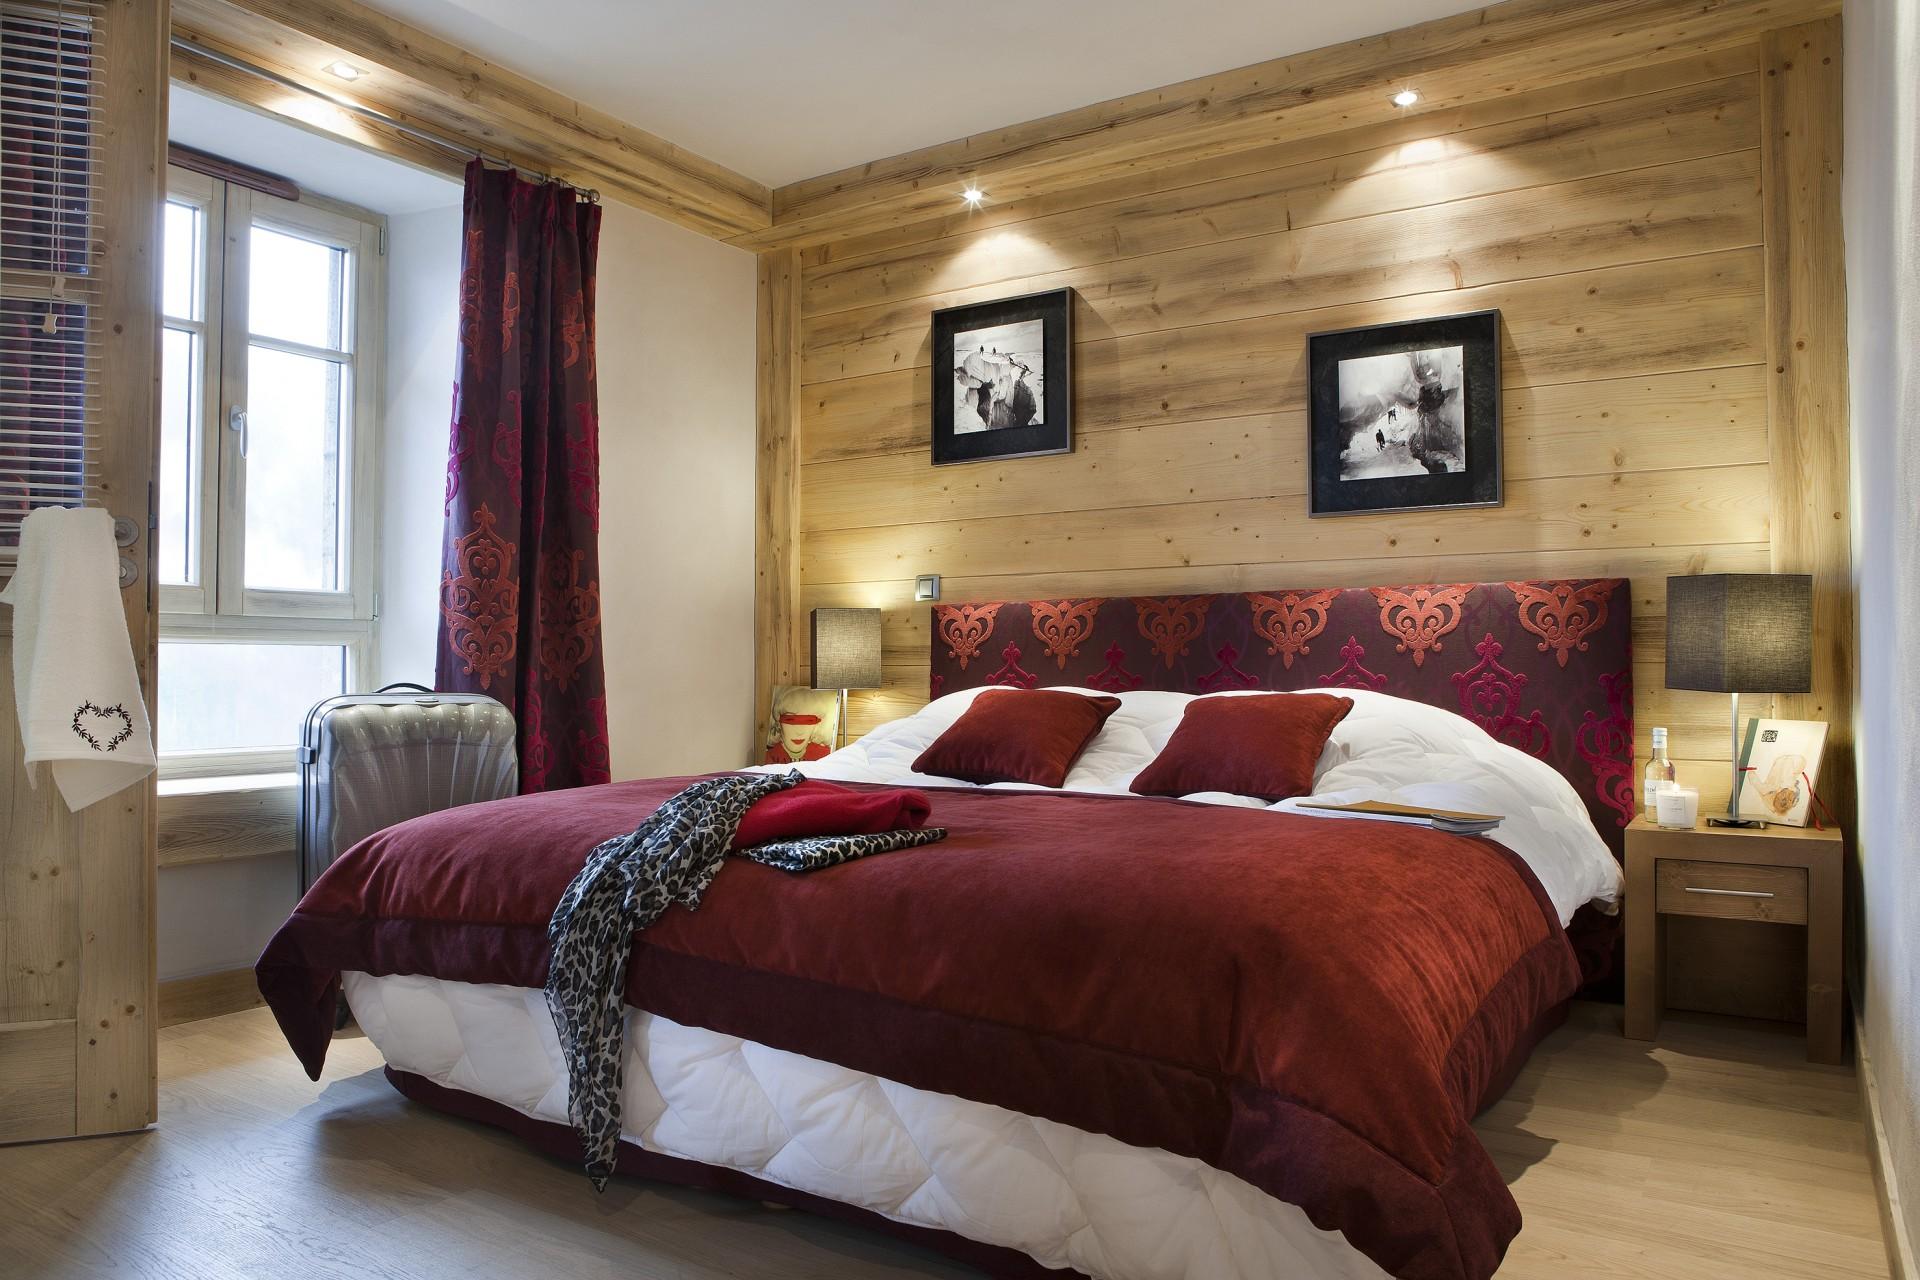 Flaine Location Appartement Luxe Fassaite Duplex Chambre